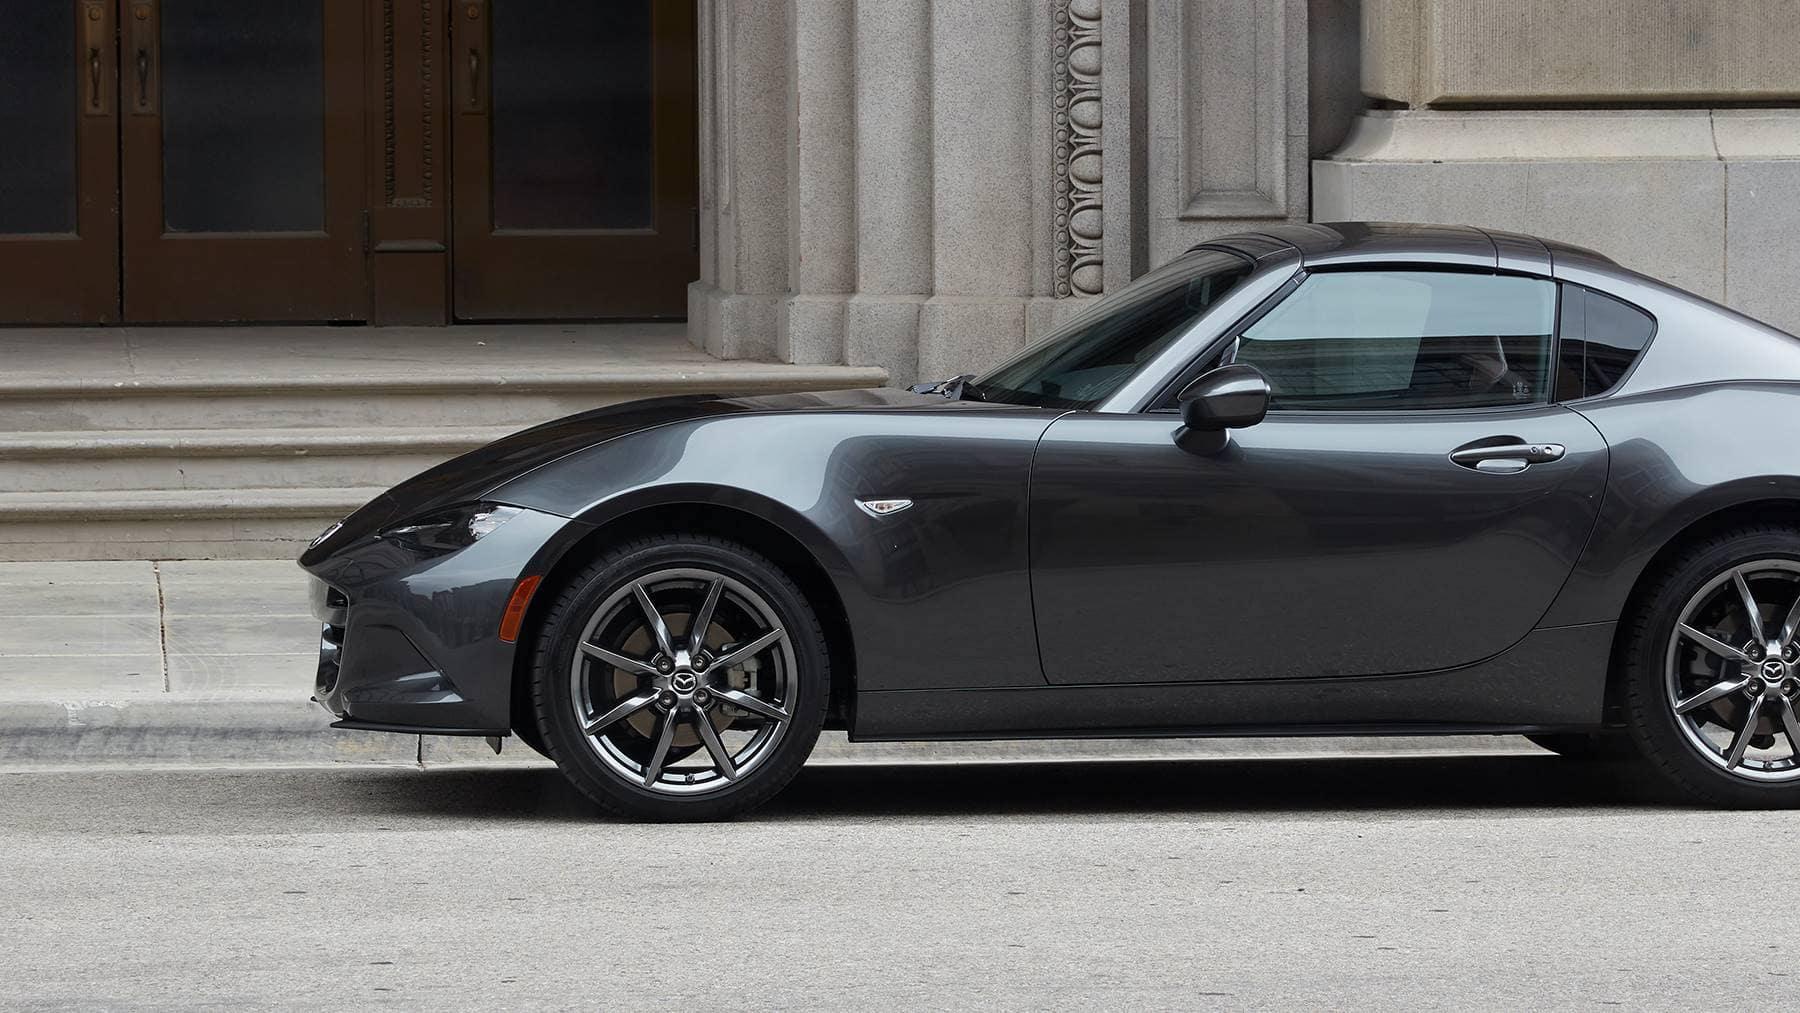 2019 Mazda mx-5 miata rf profile Pelham, AL